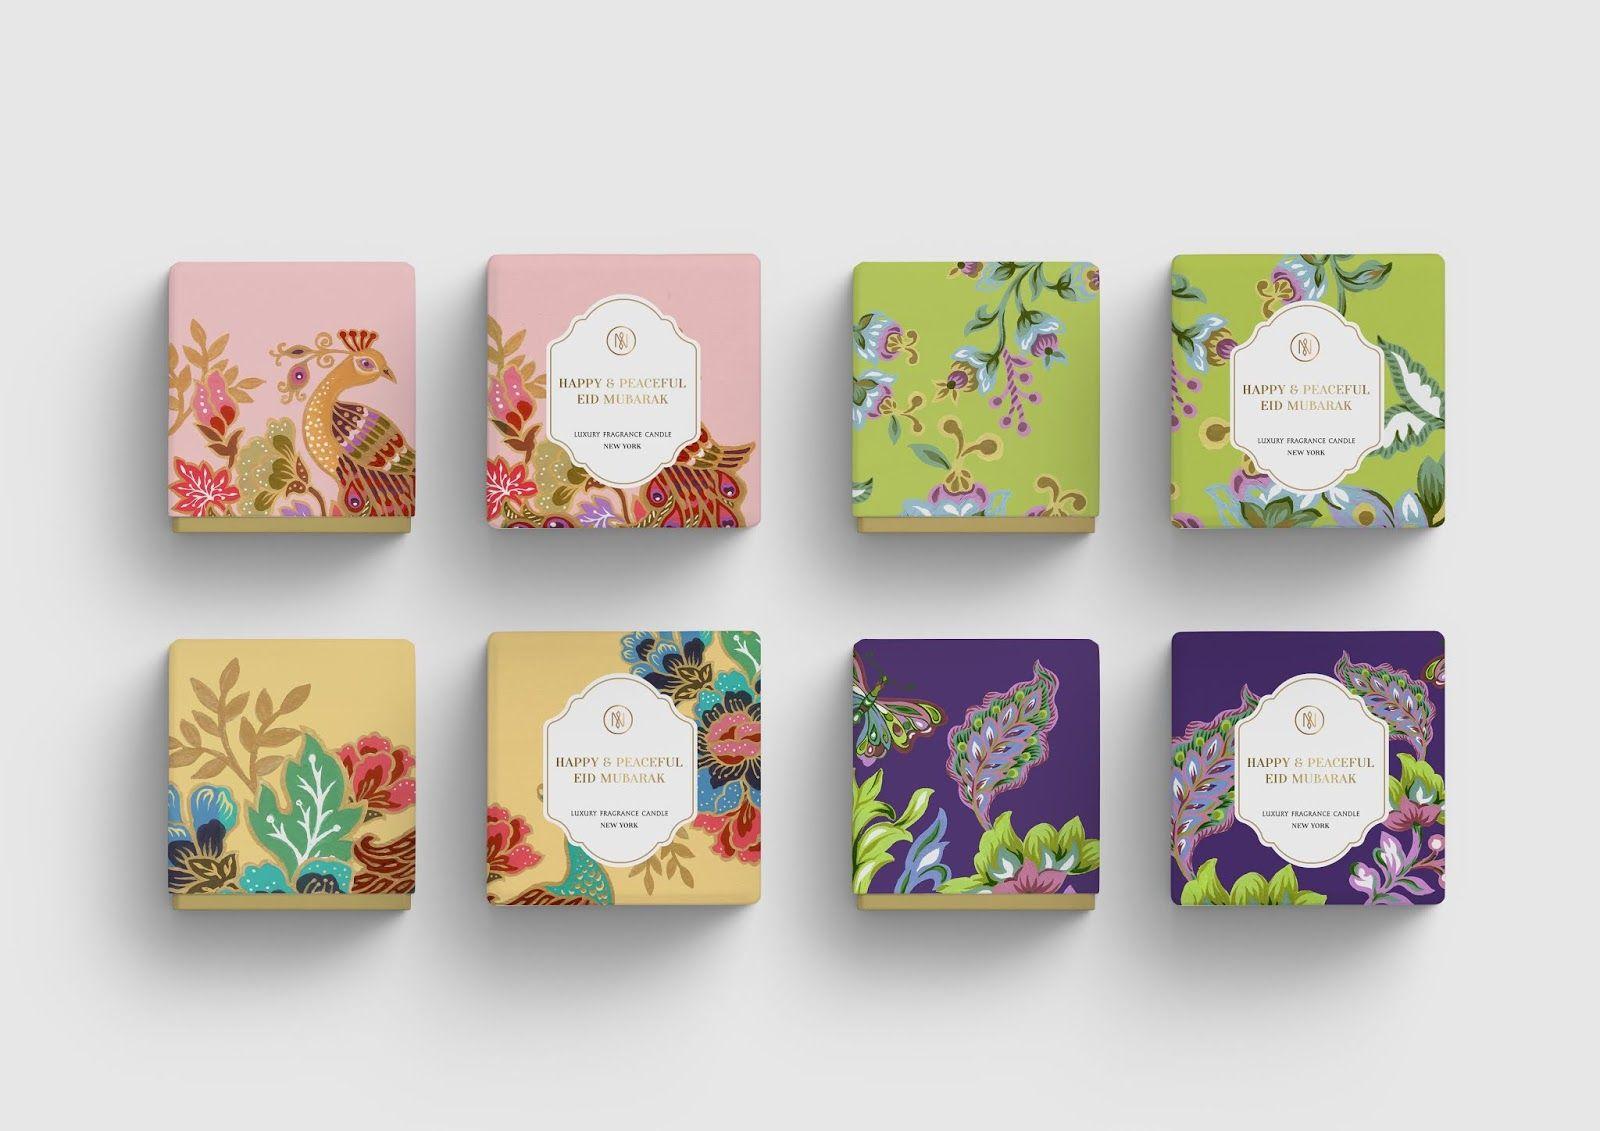 The Glory Of Eid Mubarak Tea Packaging Design Creative Packaging Design Eid Mubarak